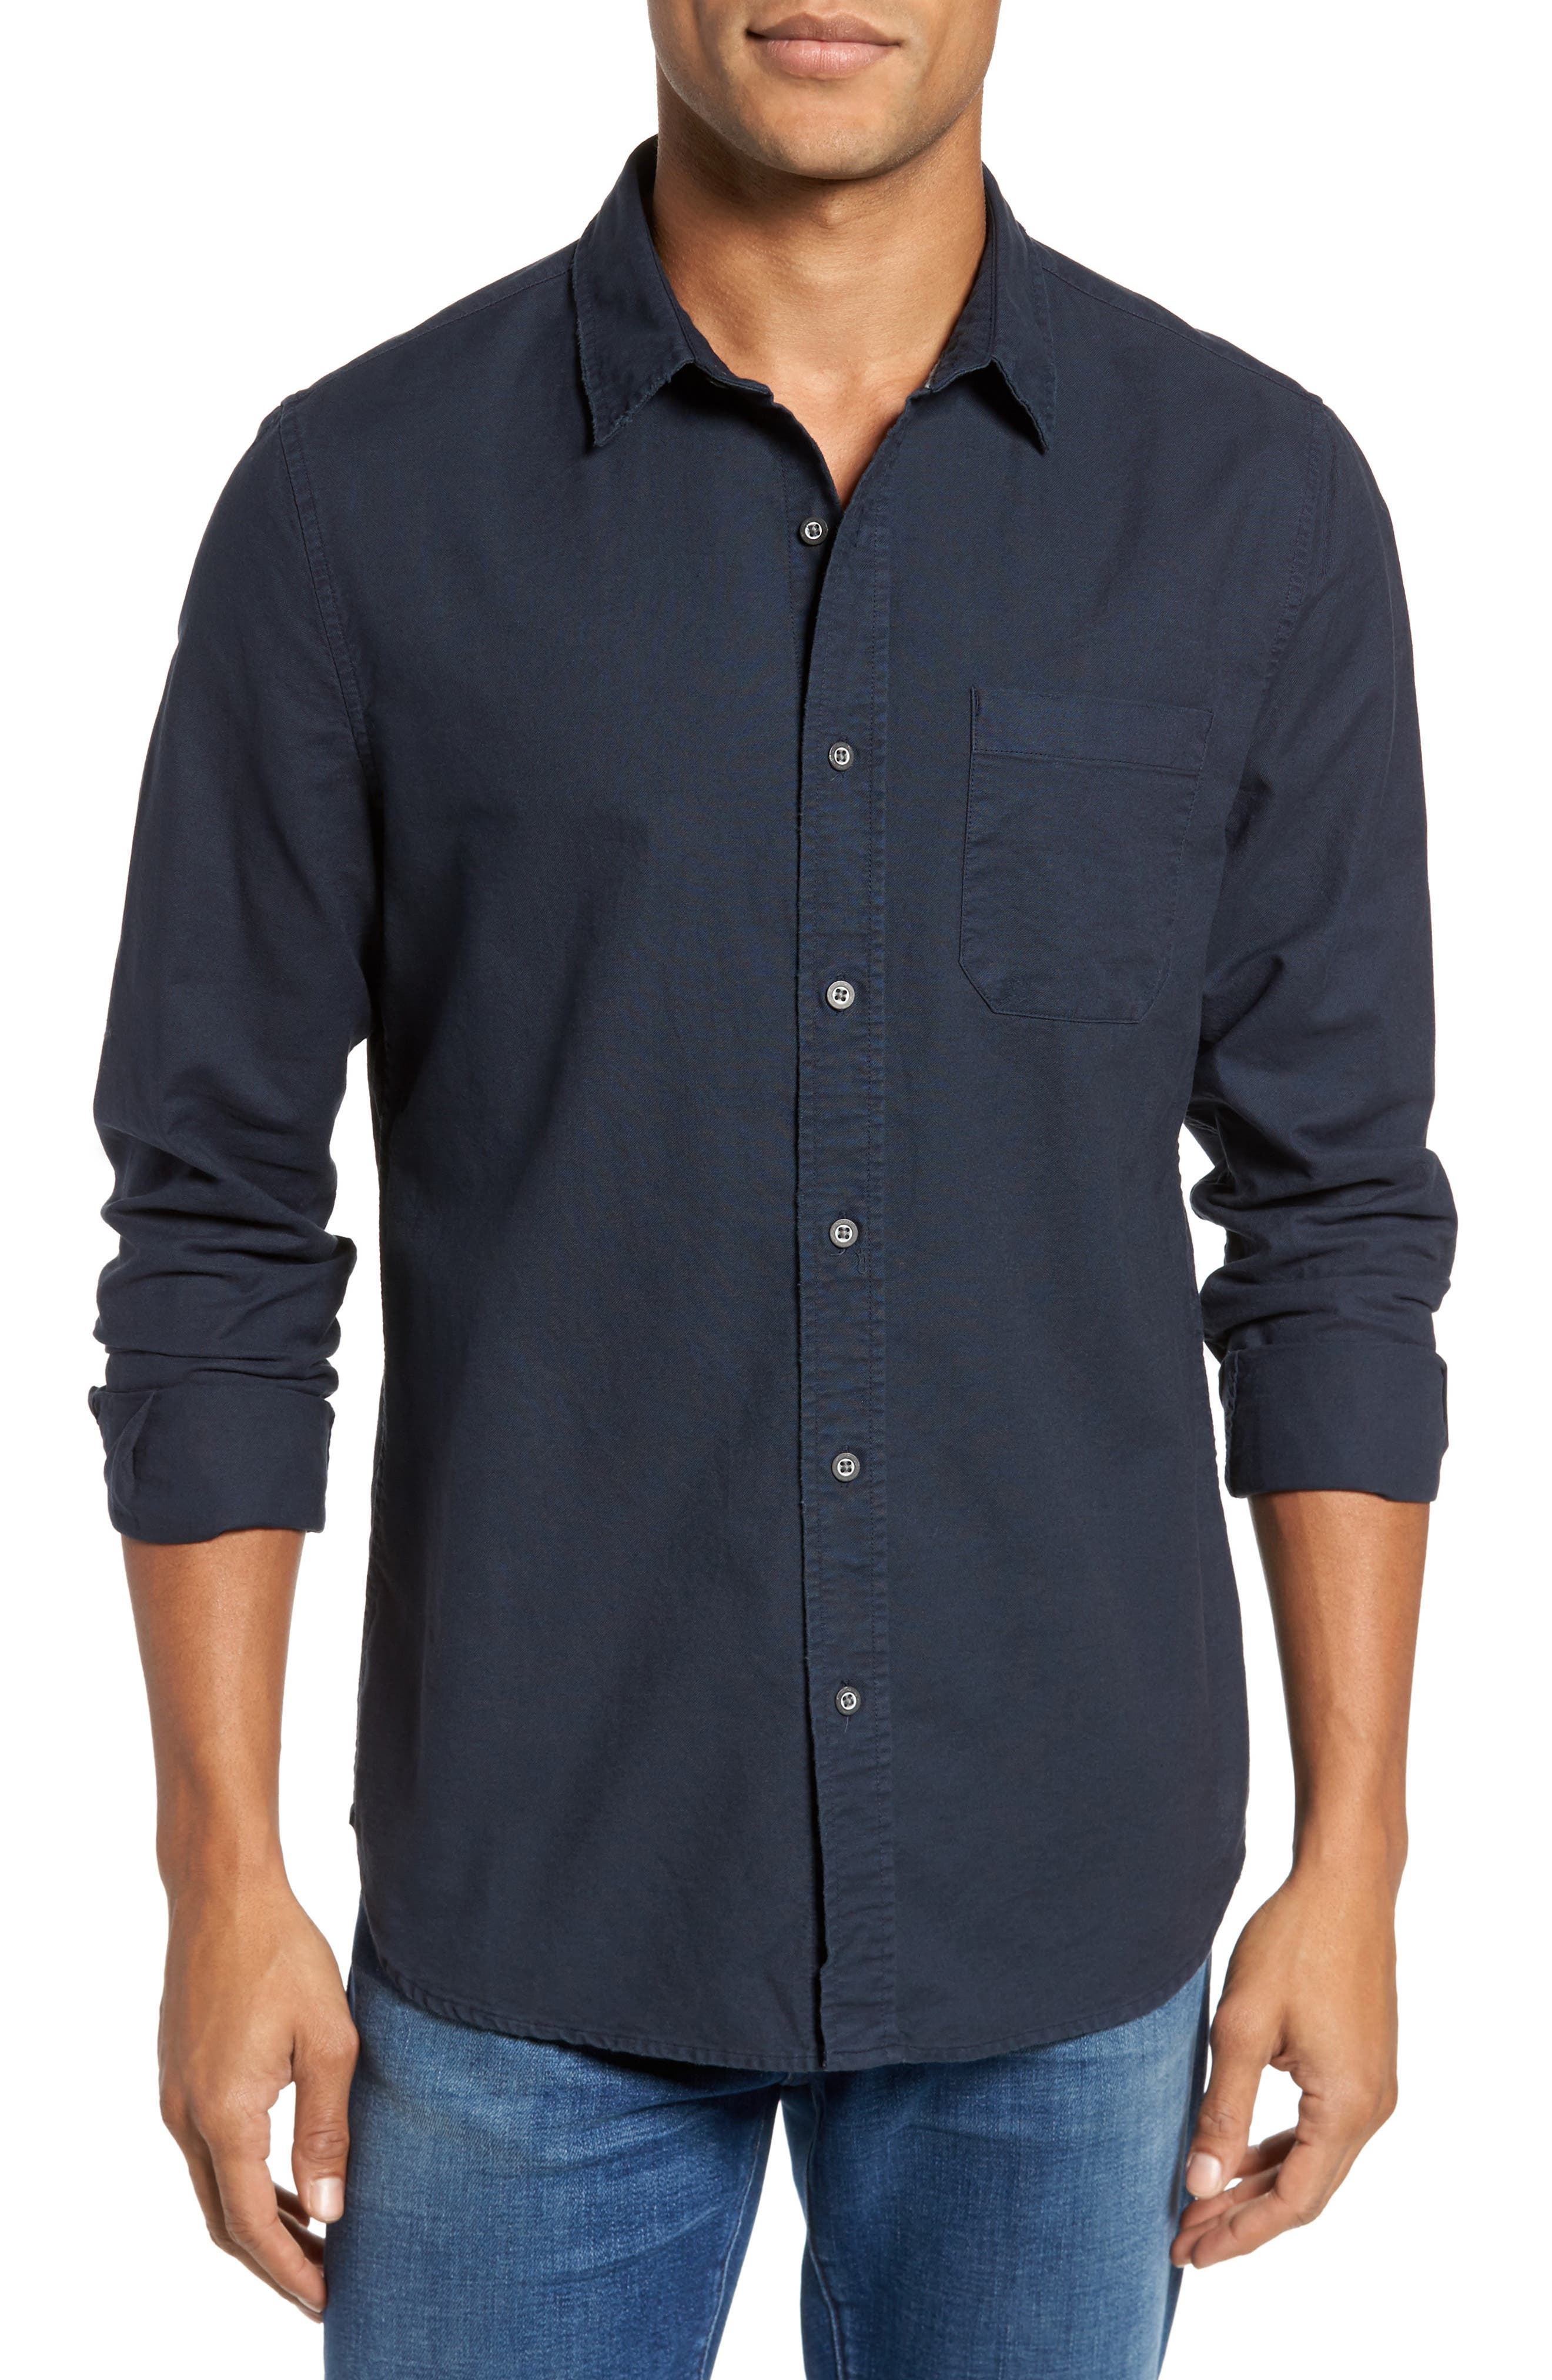 Alternate Image 1 Selected - AG Caleb Slim Fit Twill Sport Shirt